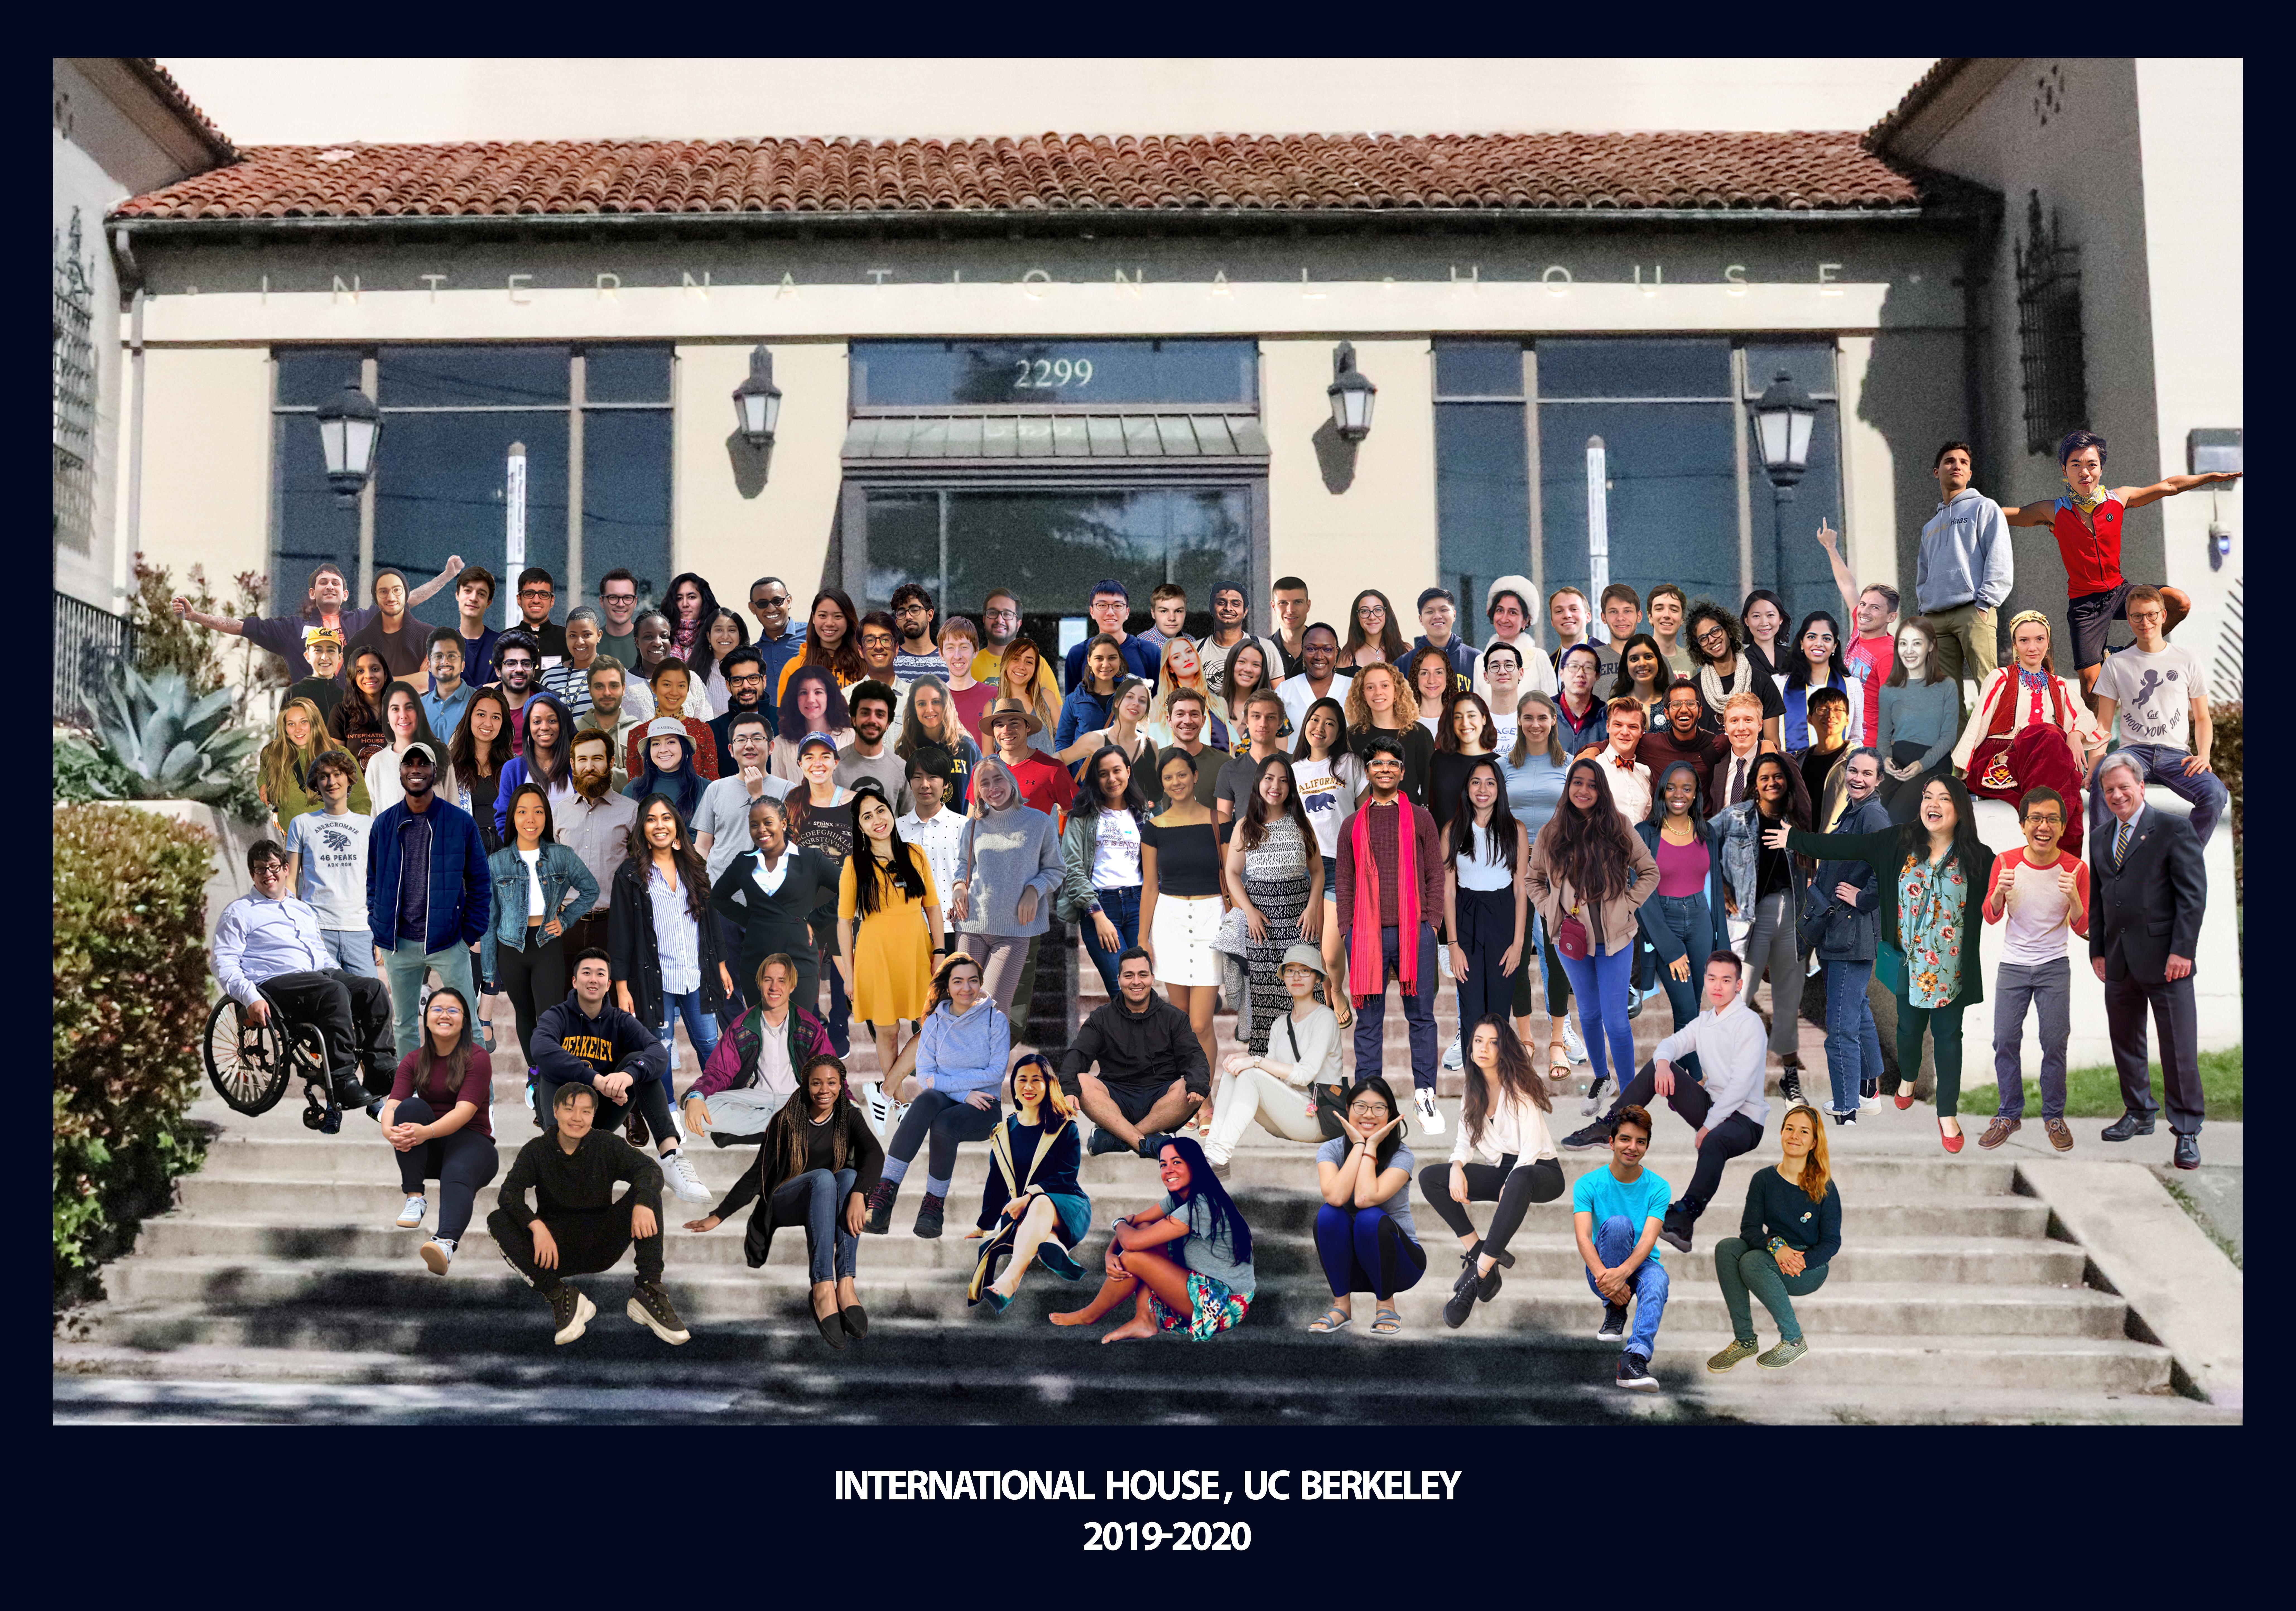 International House 2019 - 2020